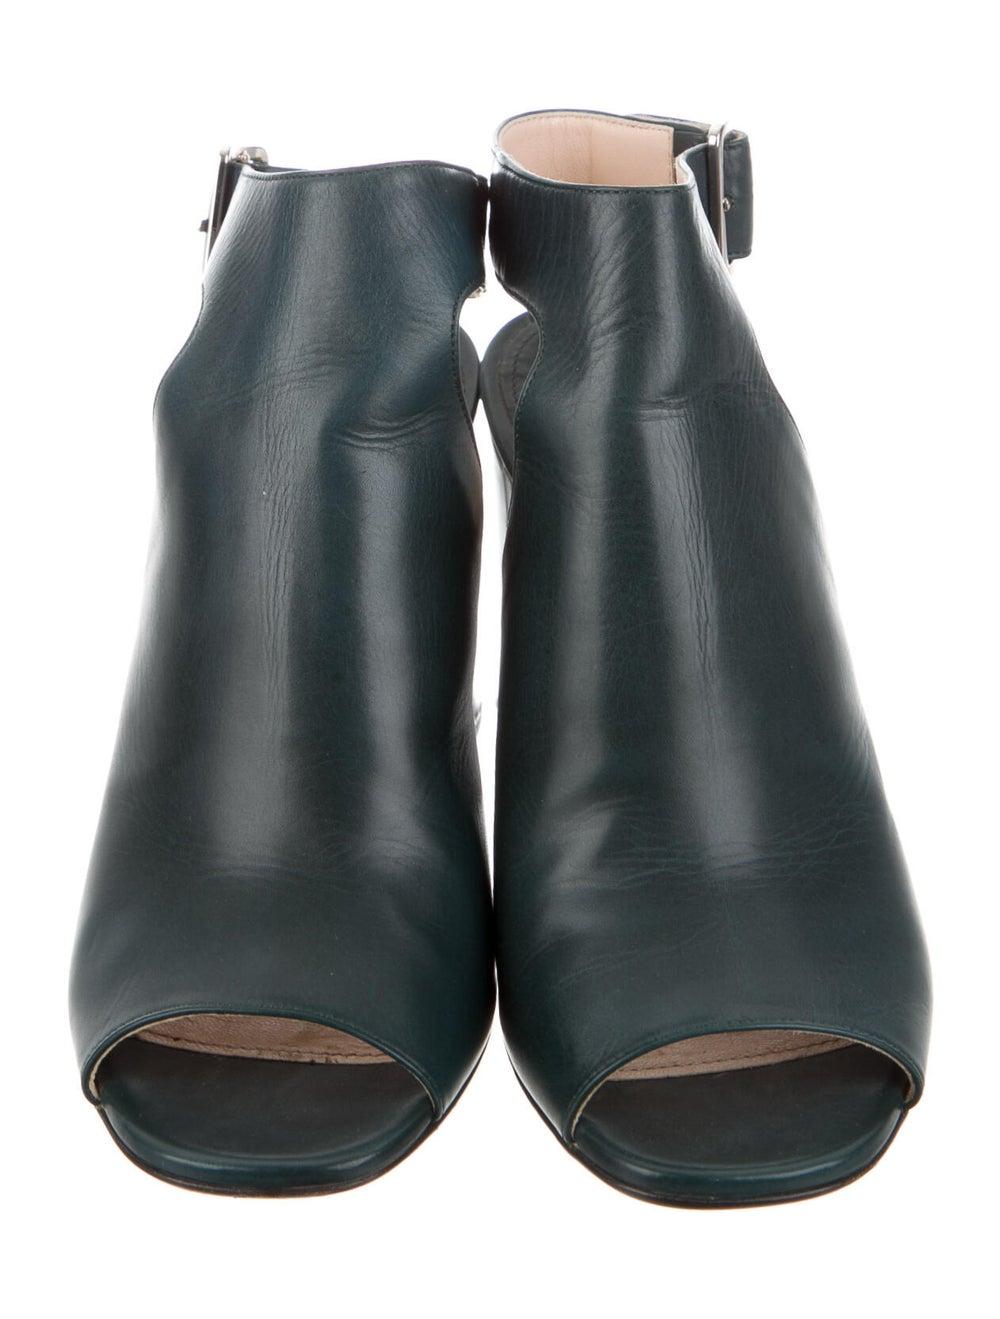 Prada Leather Boots Green - image 3